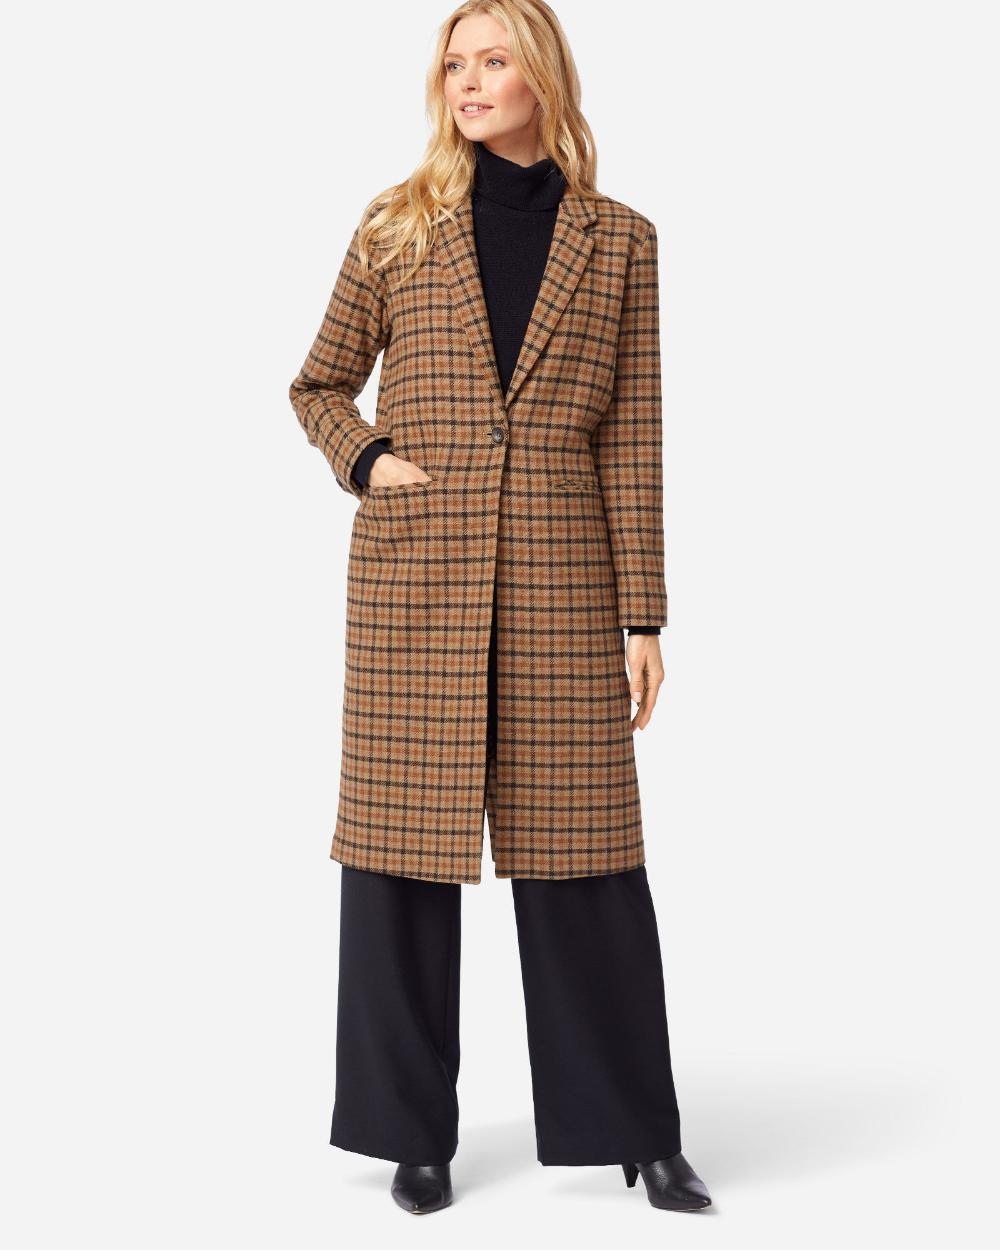 Women S Hudson Long Coat Pendleton Long Coat Fashion Coat [ 1250 x 1000 Pixel ]